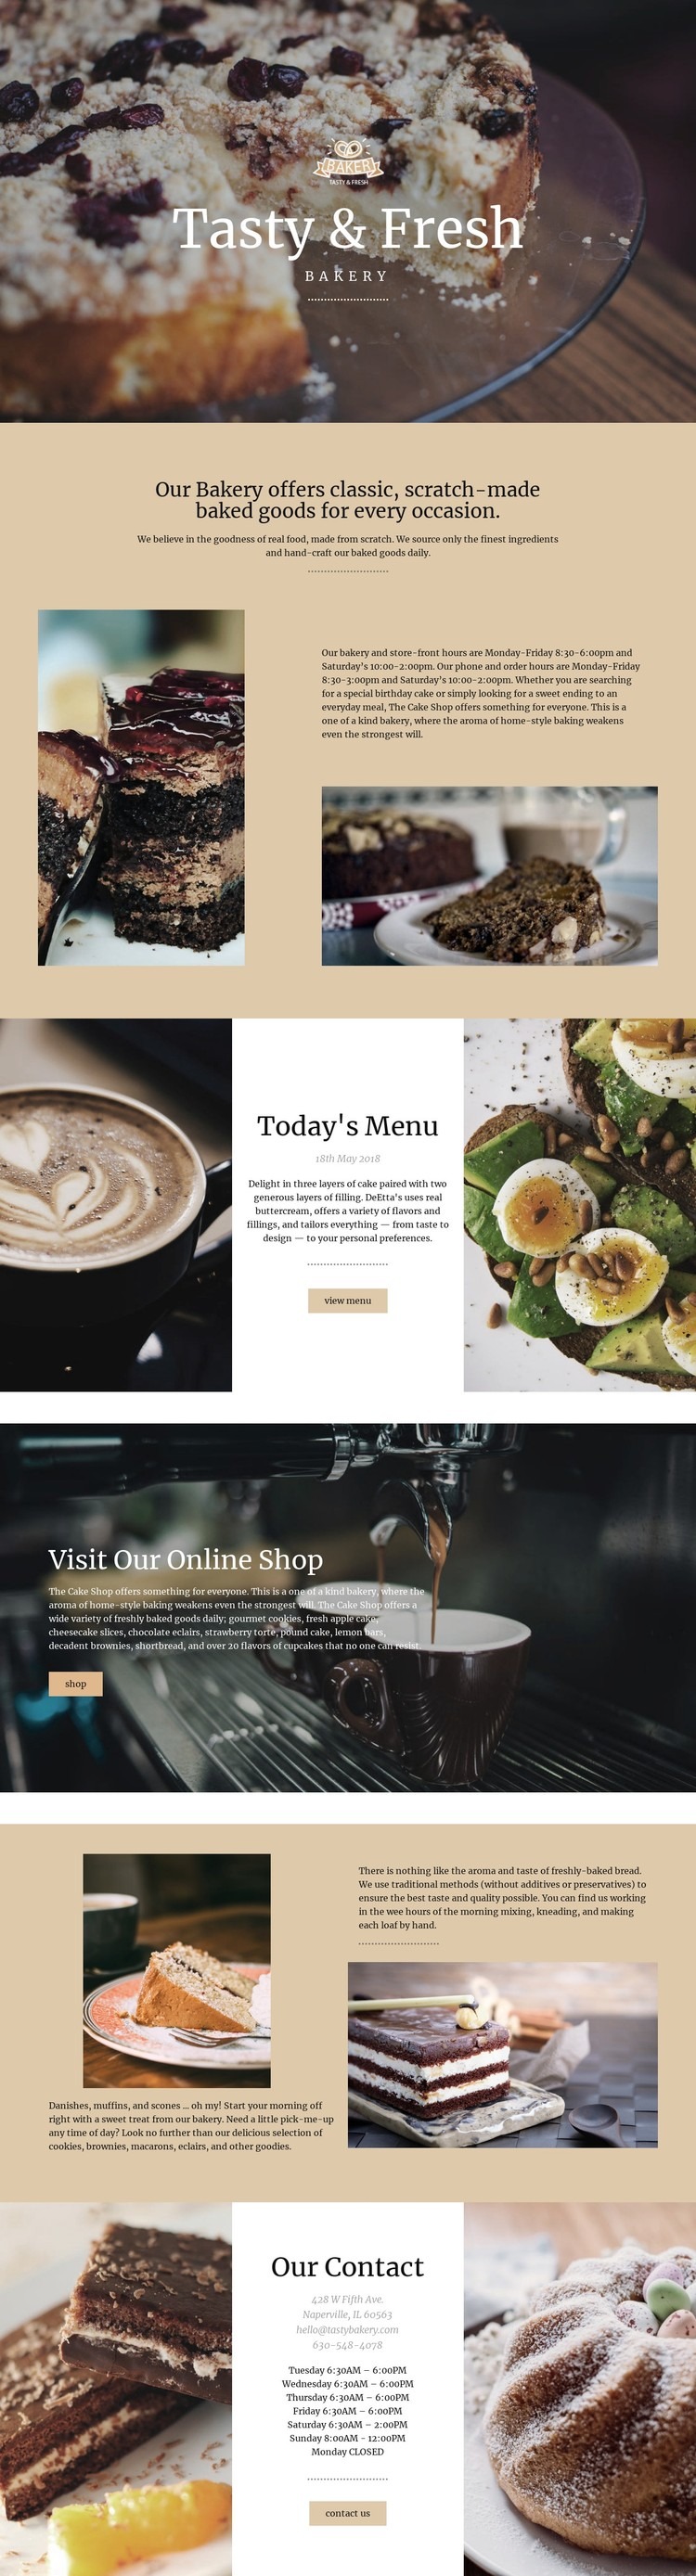 Tasty and fresh food Static Site Generator